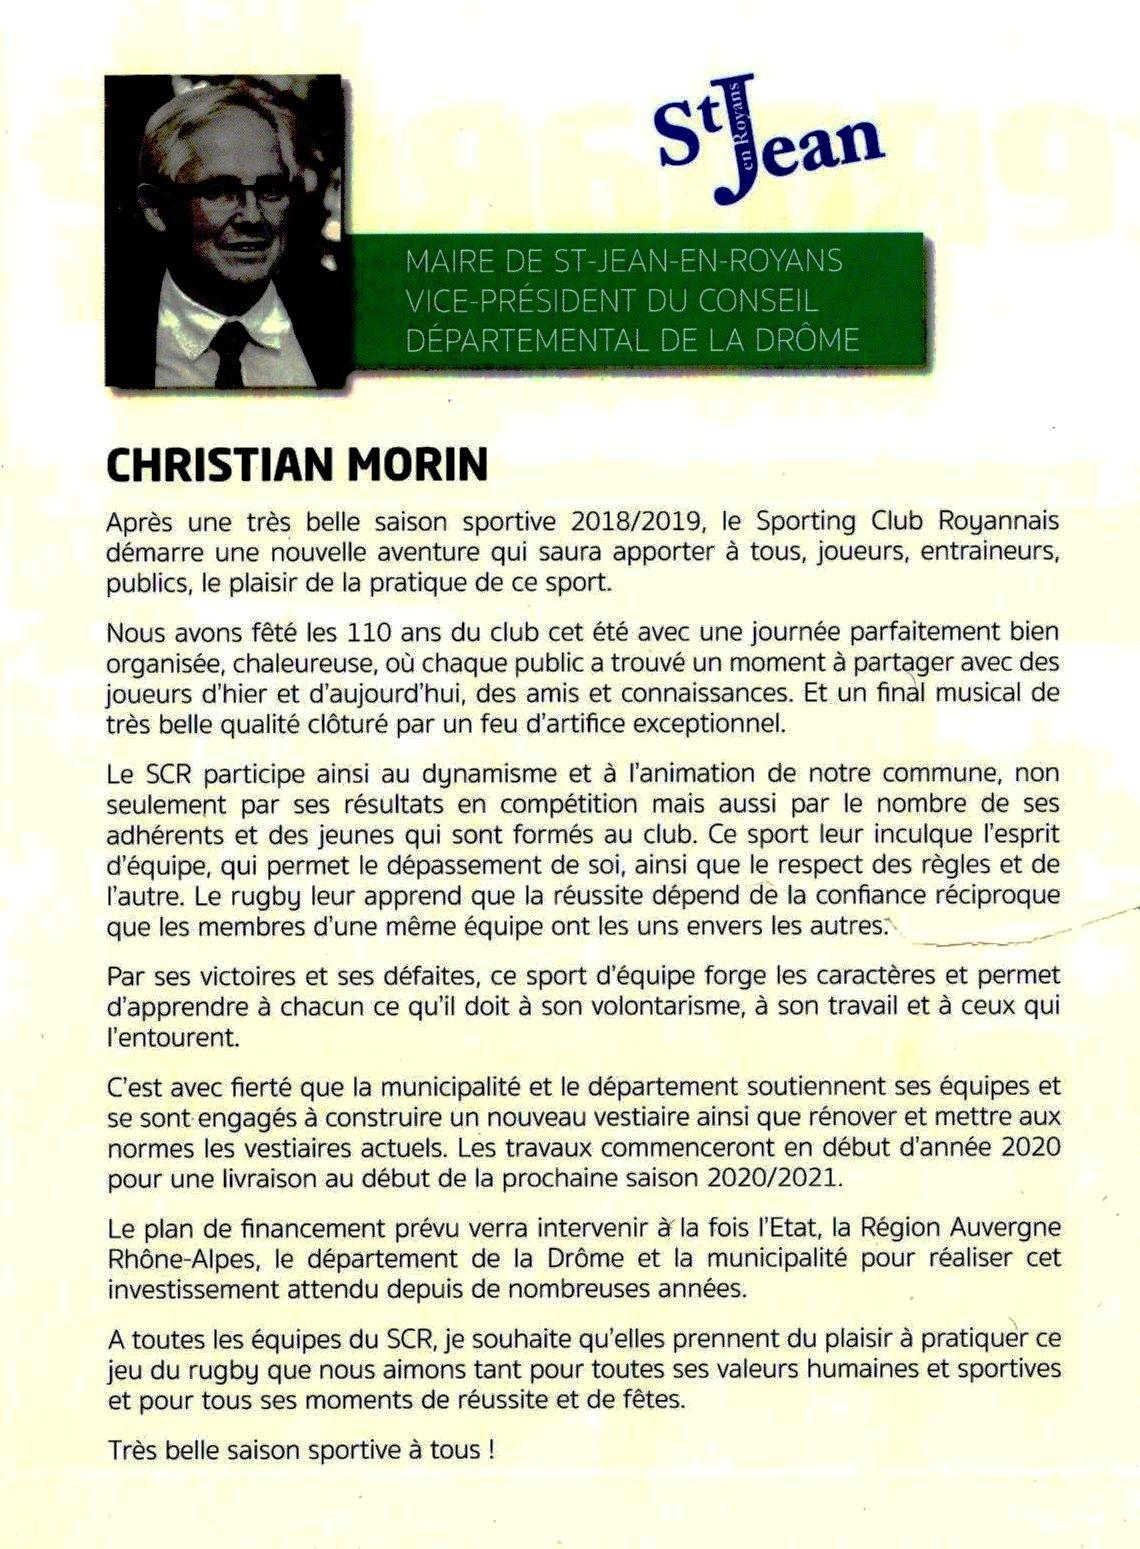 Christian Morin